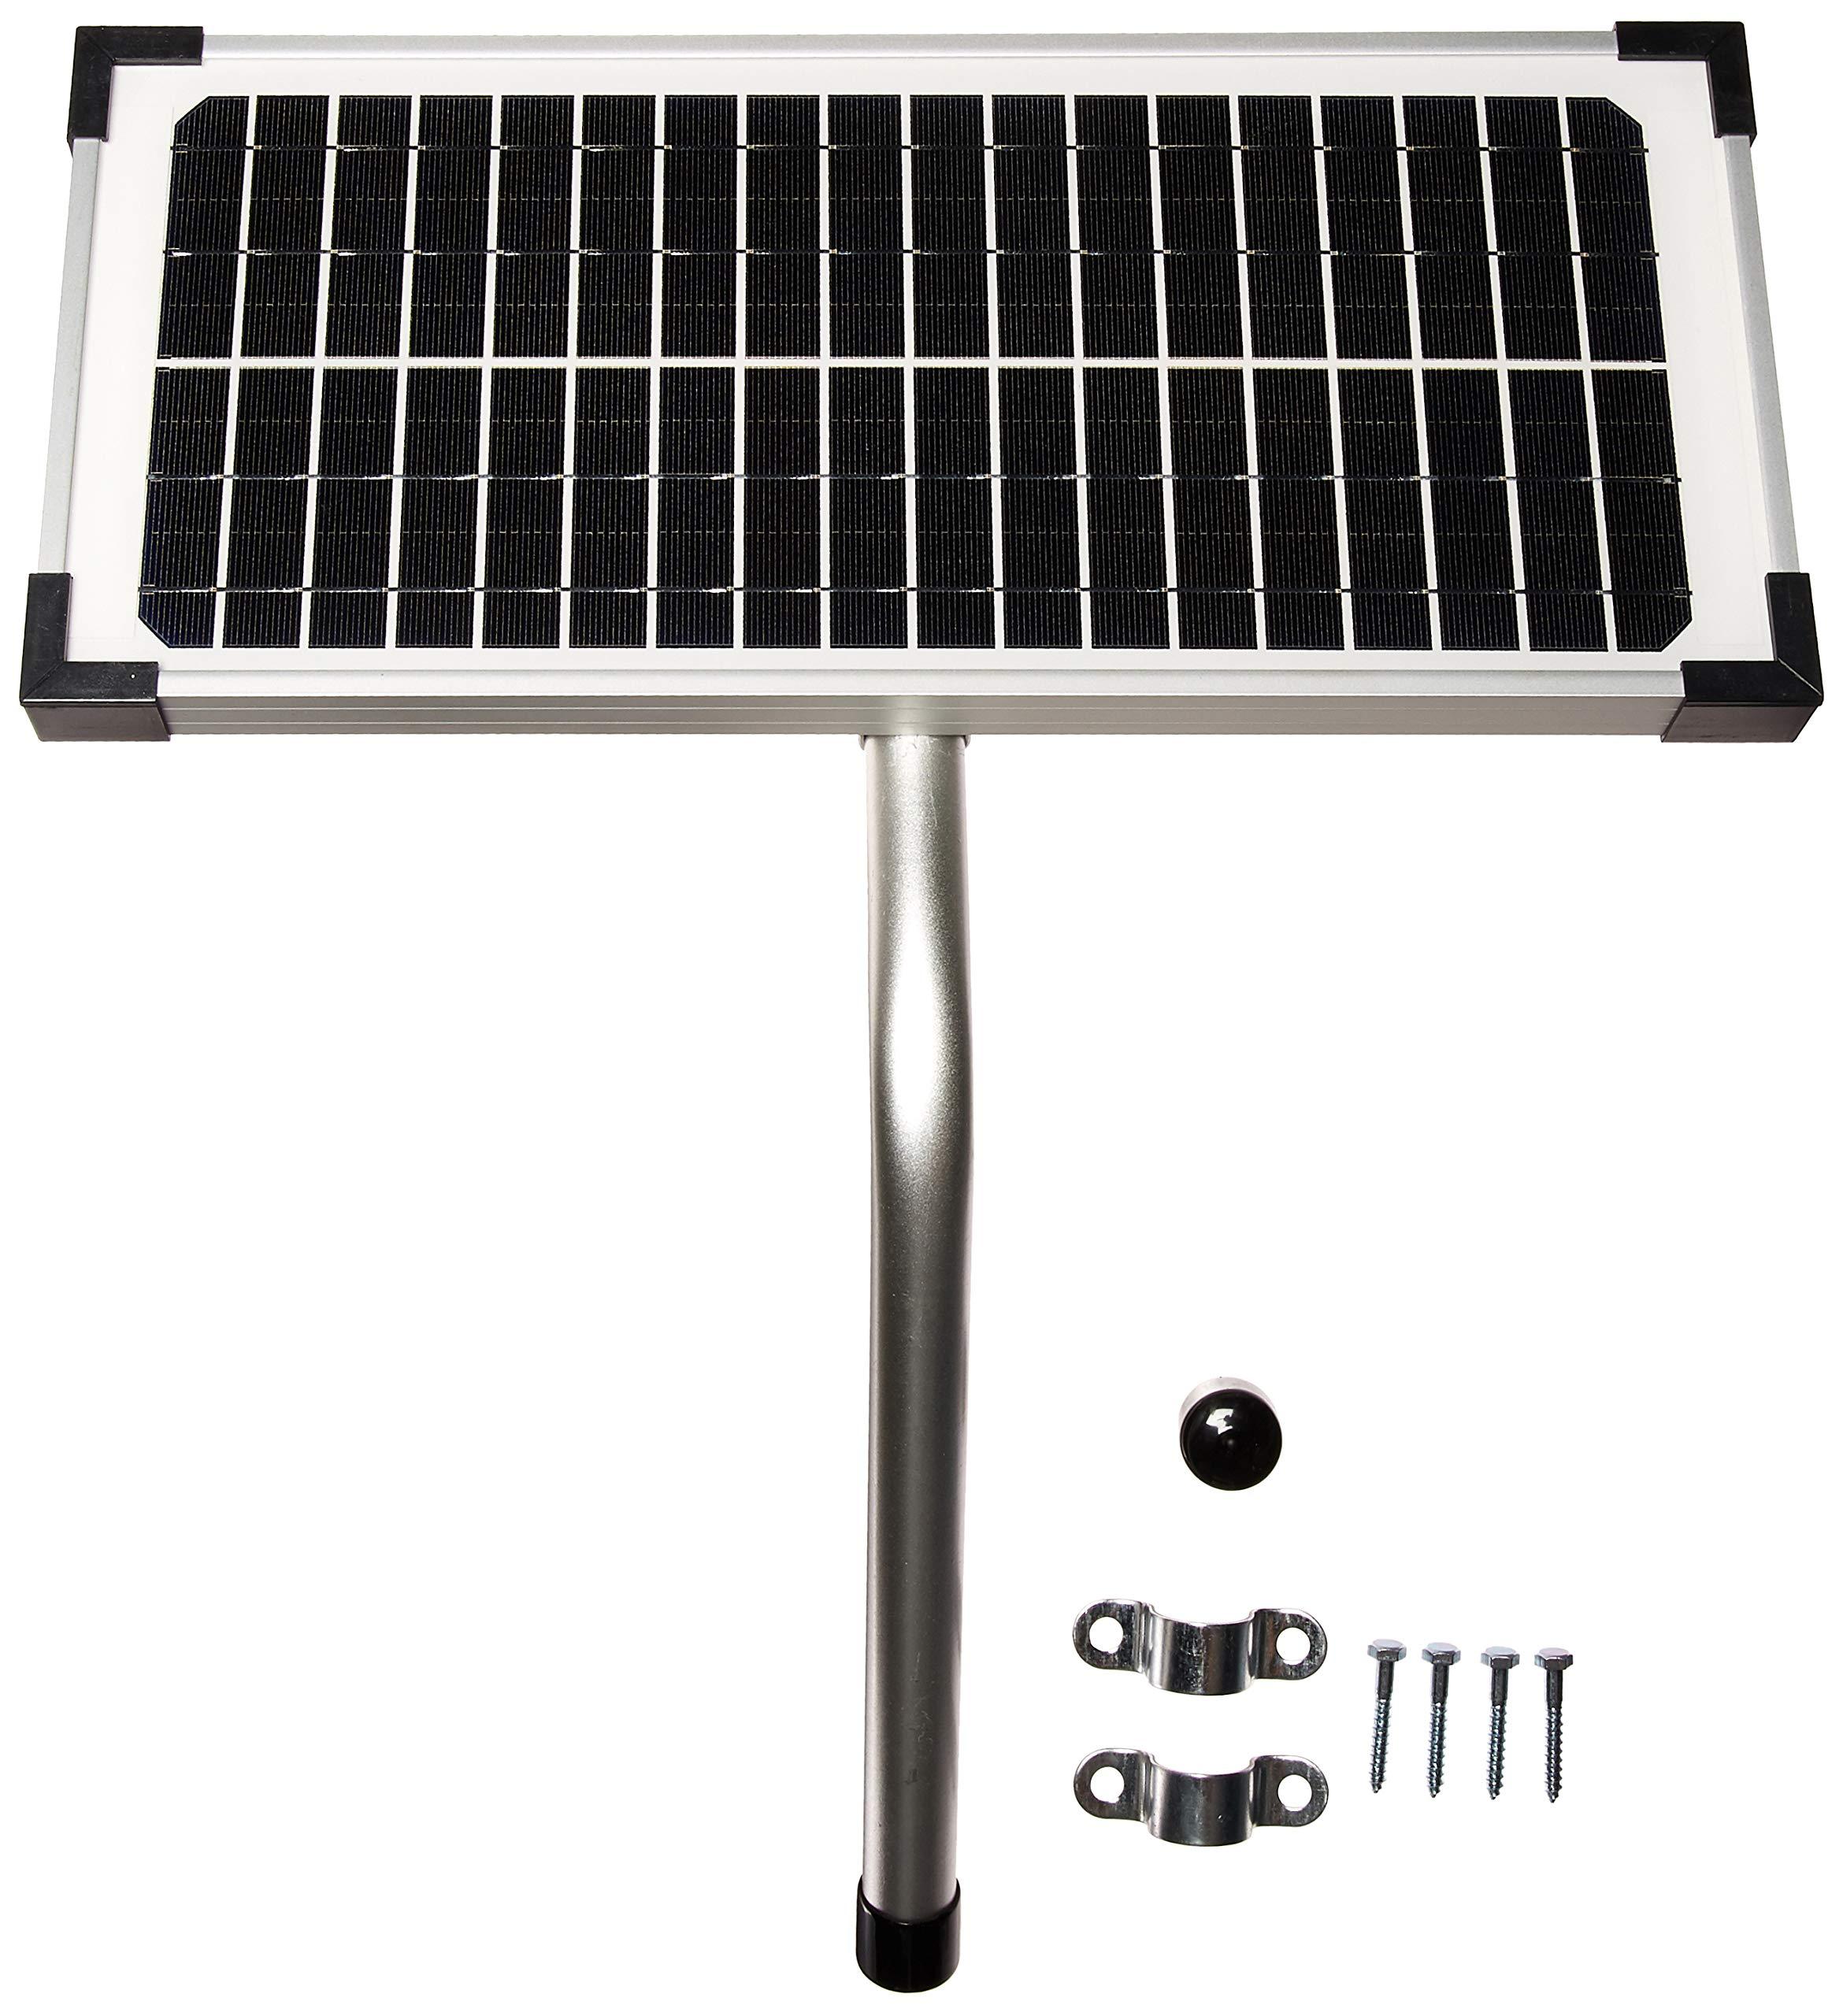 10 Watt Solar Panel Kit (FM123) for Mighty Mule Automatic Gate Openers by Mighty Mule